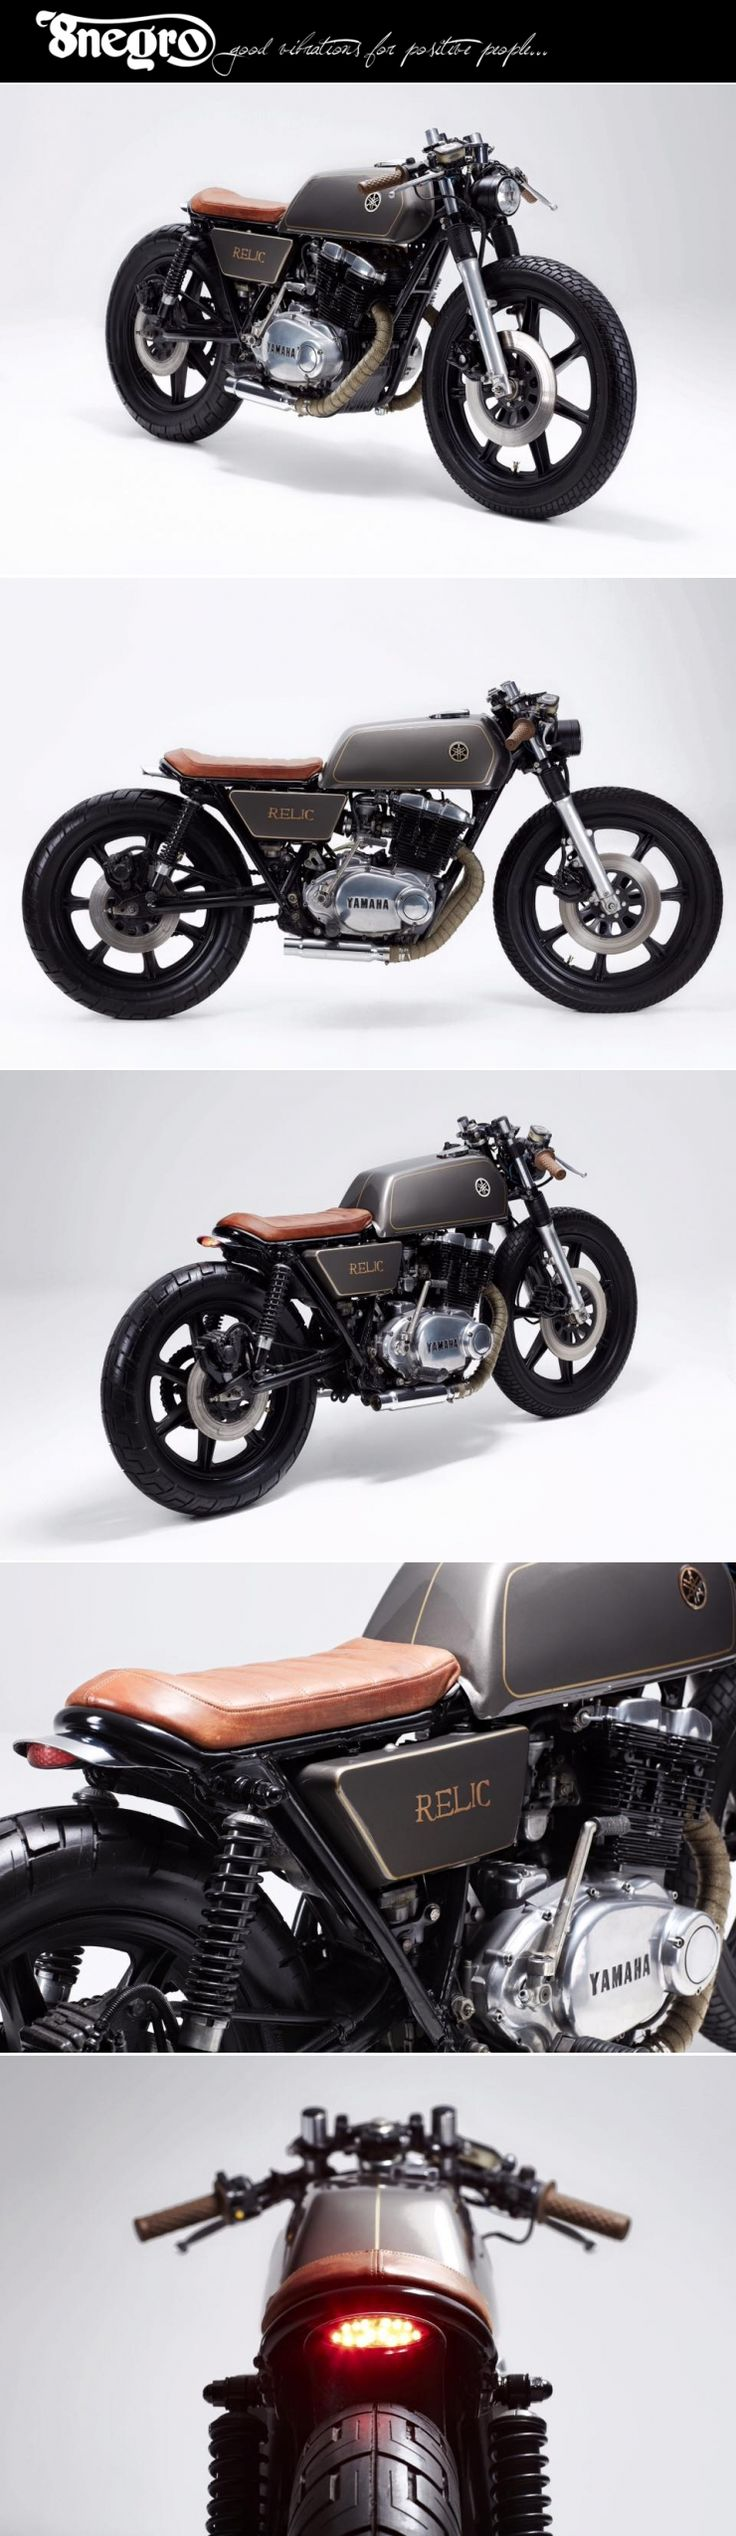 Yamaha XS500:: Relic Motorcycles.| 8negro